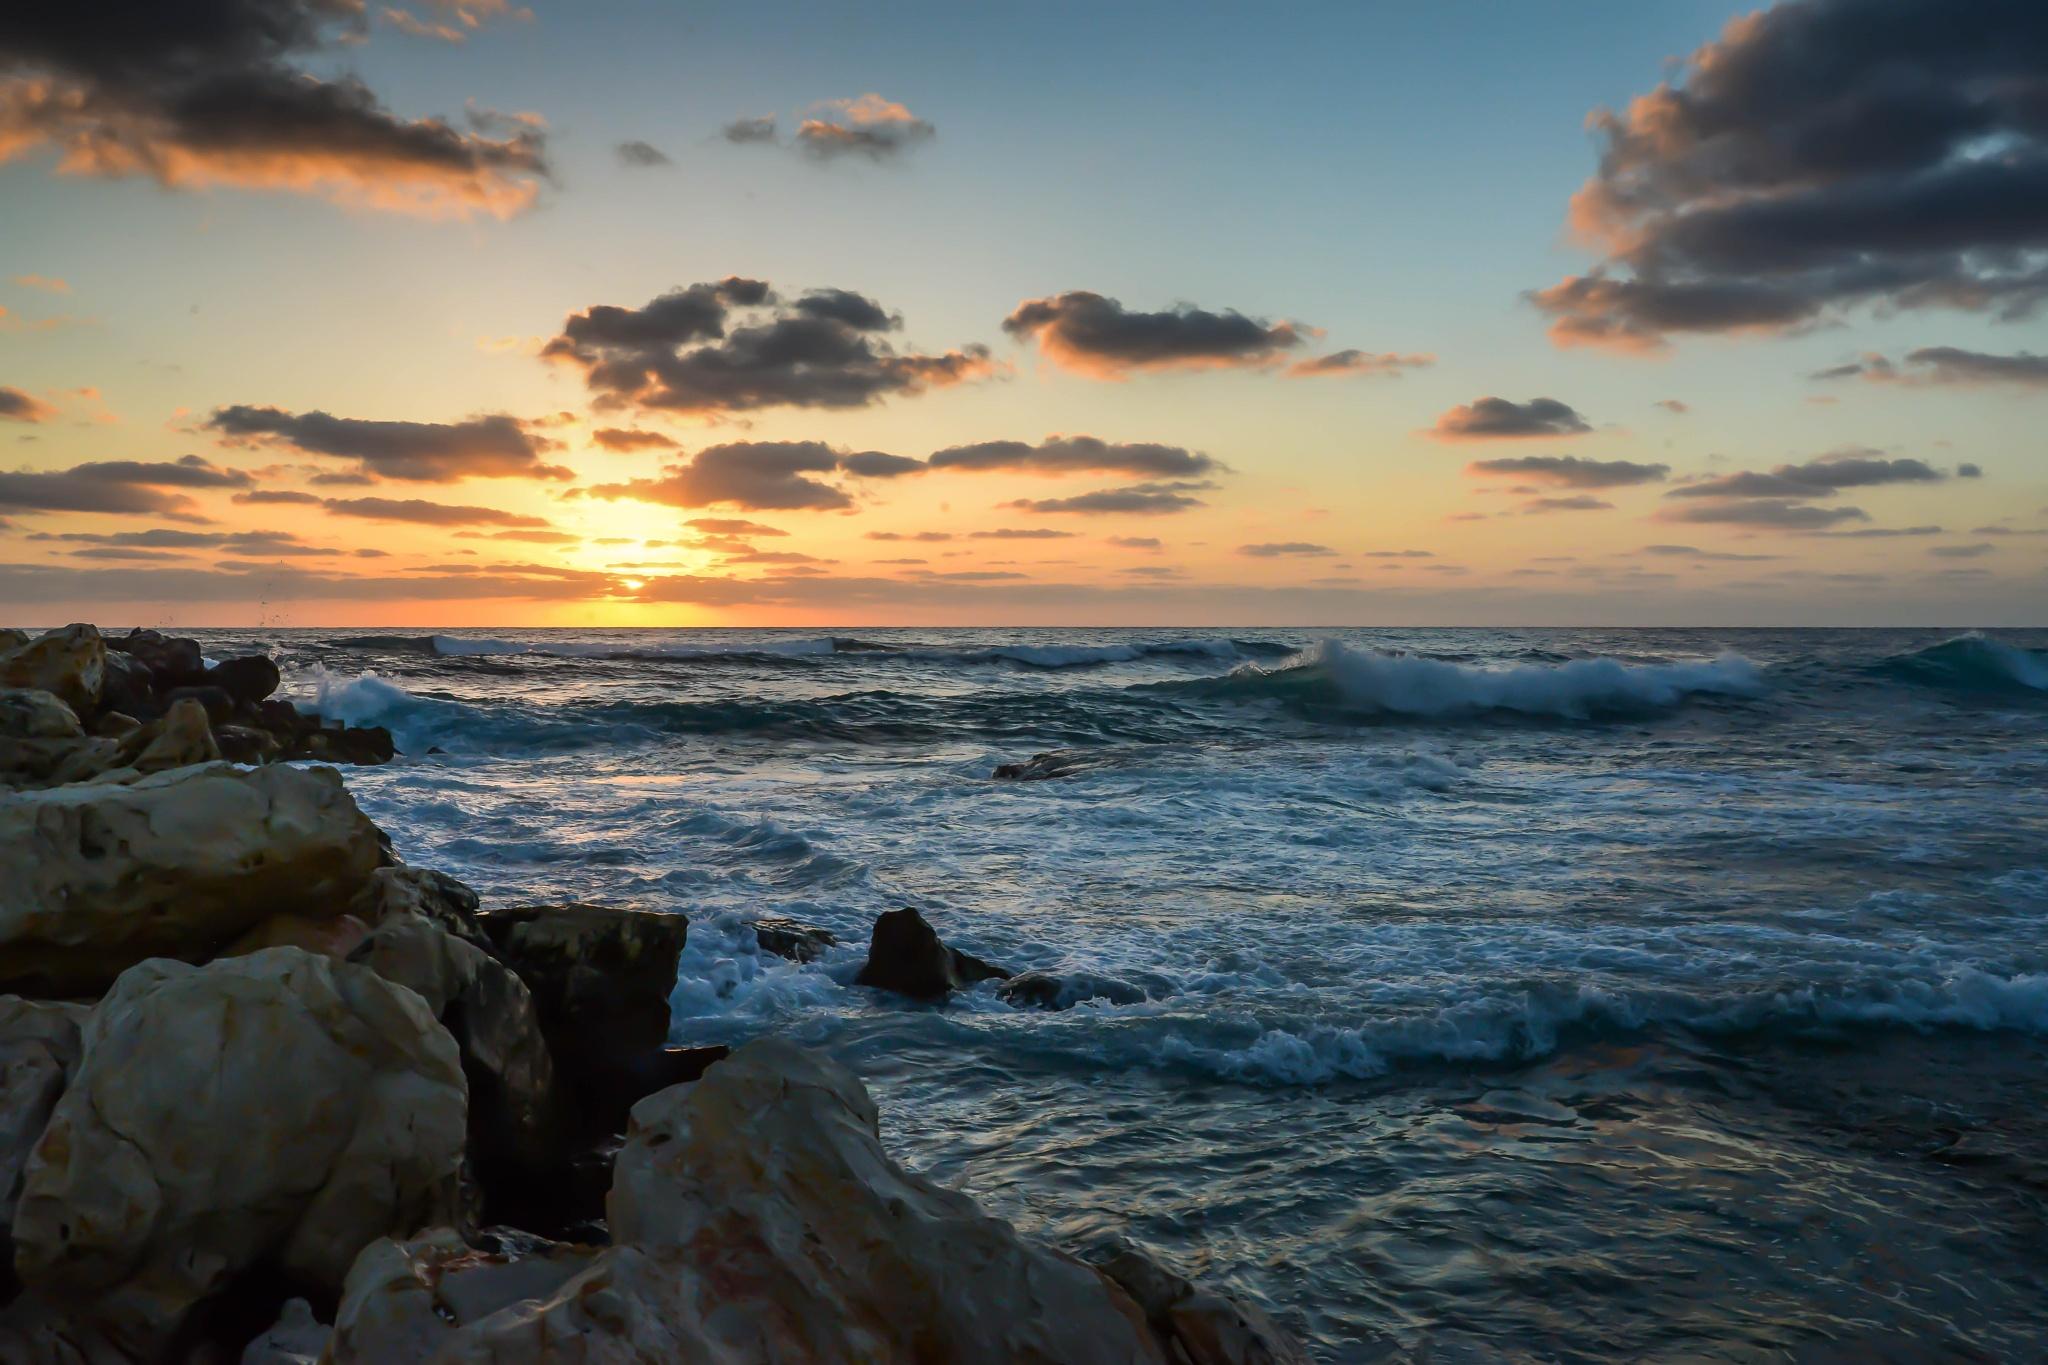 Rocks, Sea and Sunset by muhammad.nasser.963